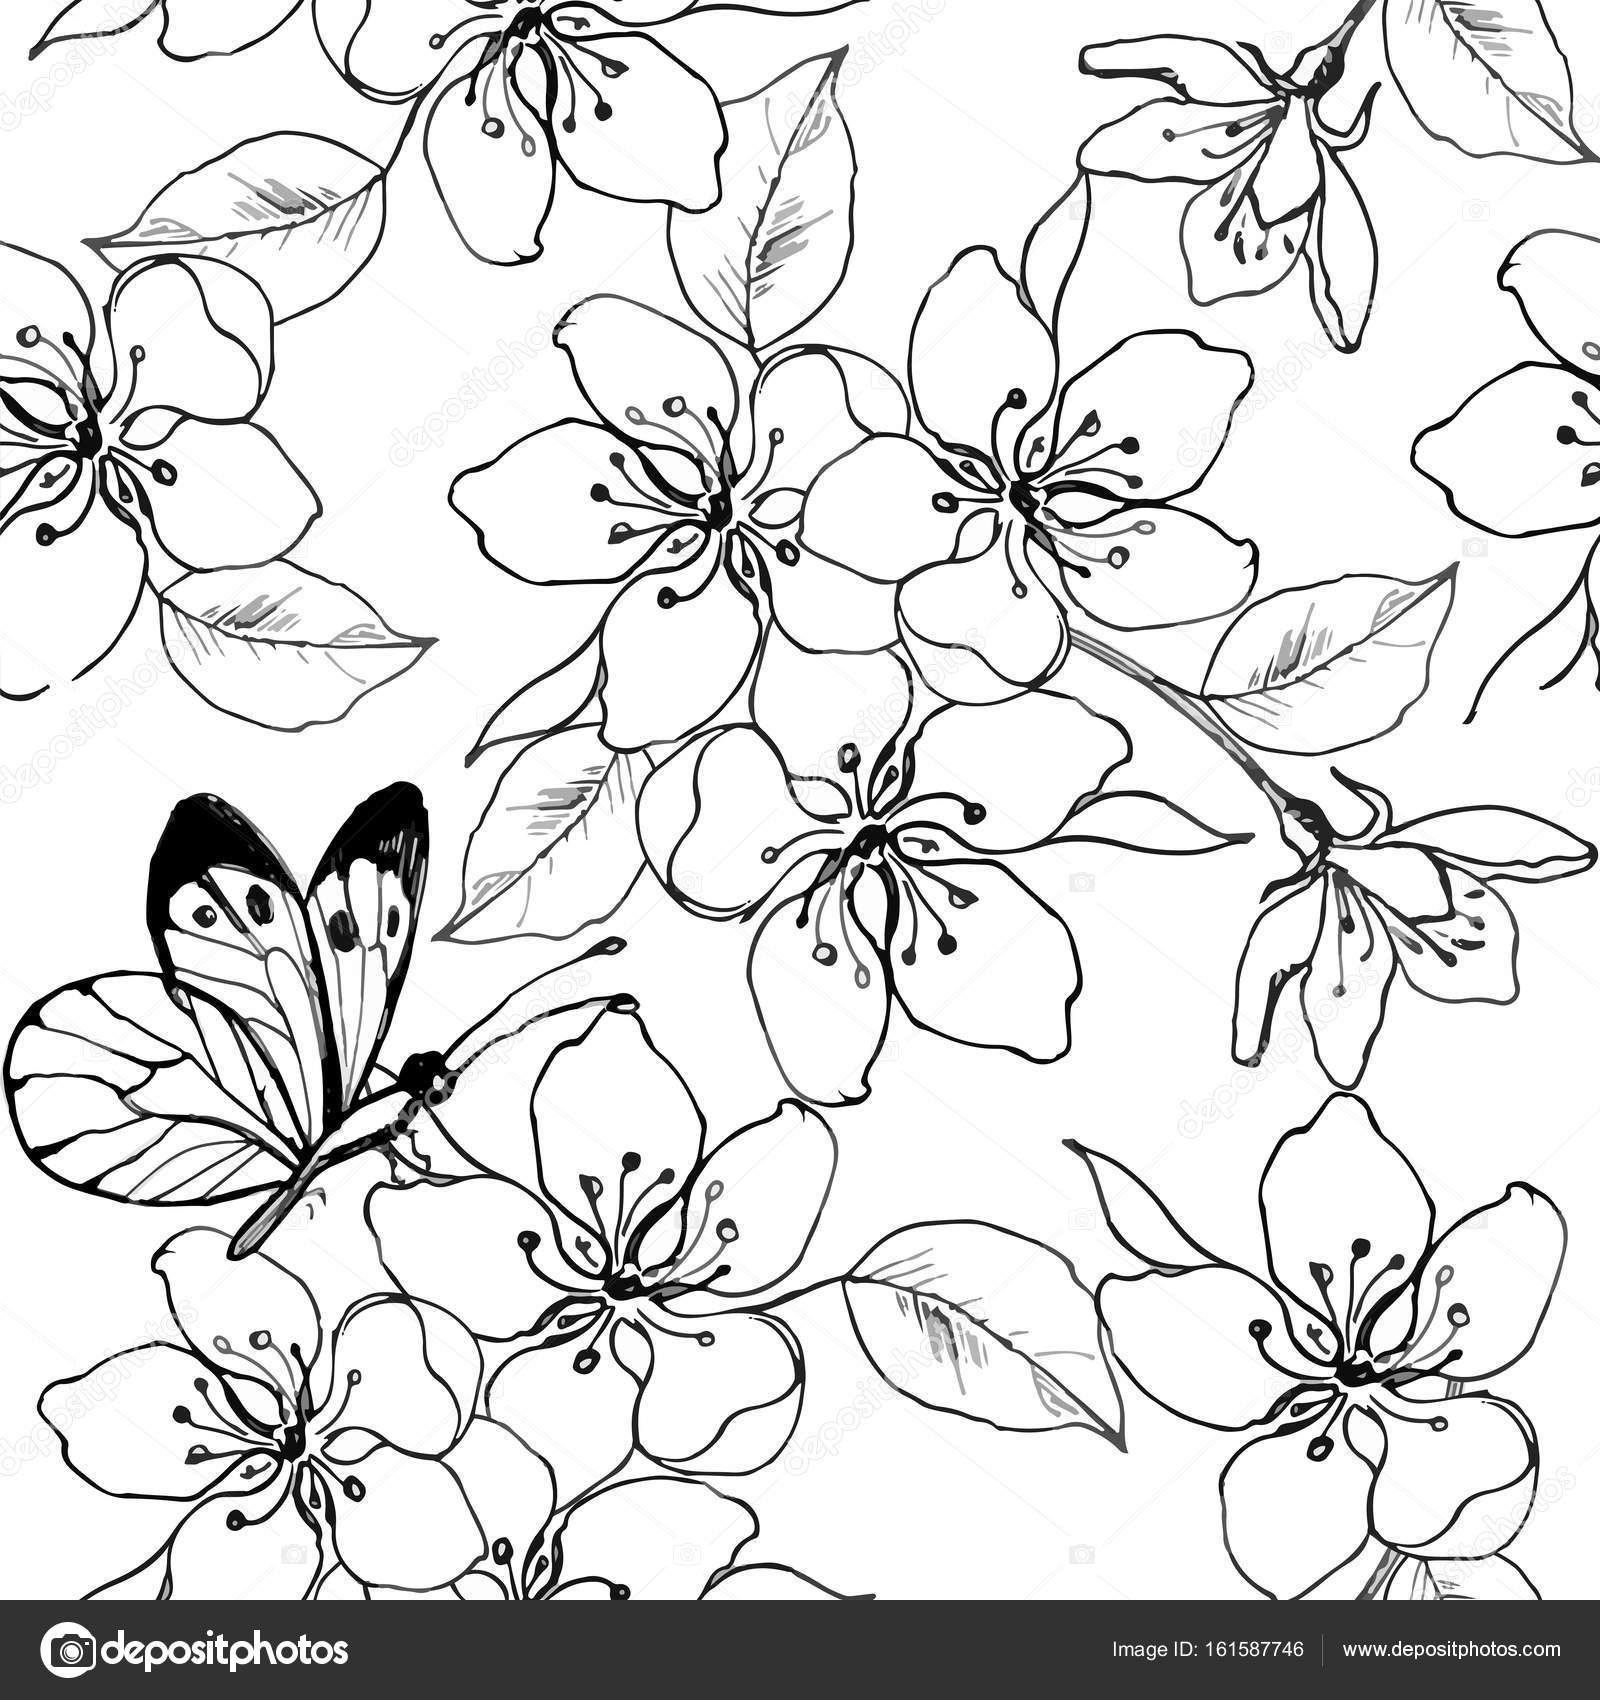 1600x1700 Hand Drawn Branch Of Cherry Blossom, Pear, Apple Tree